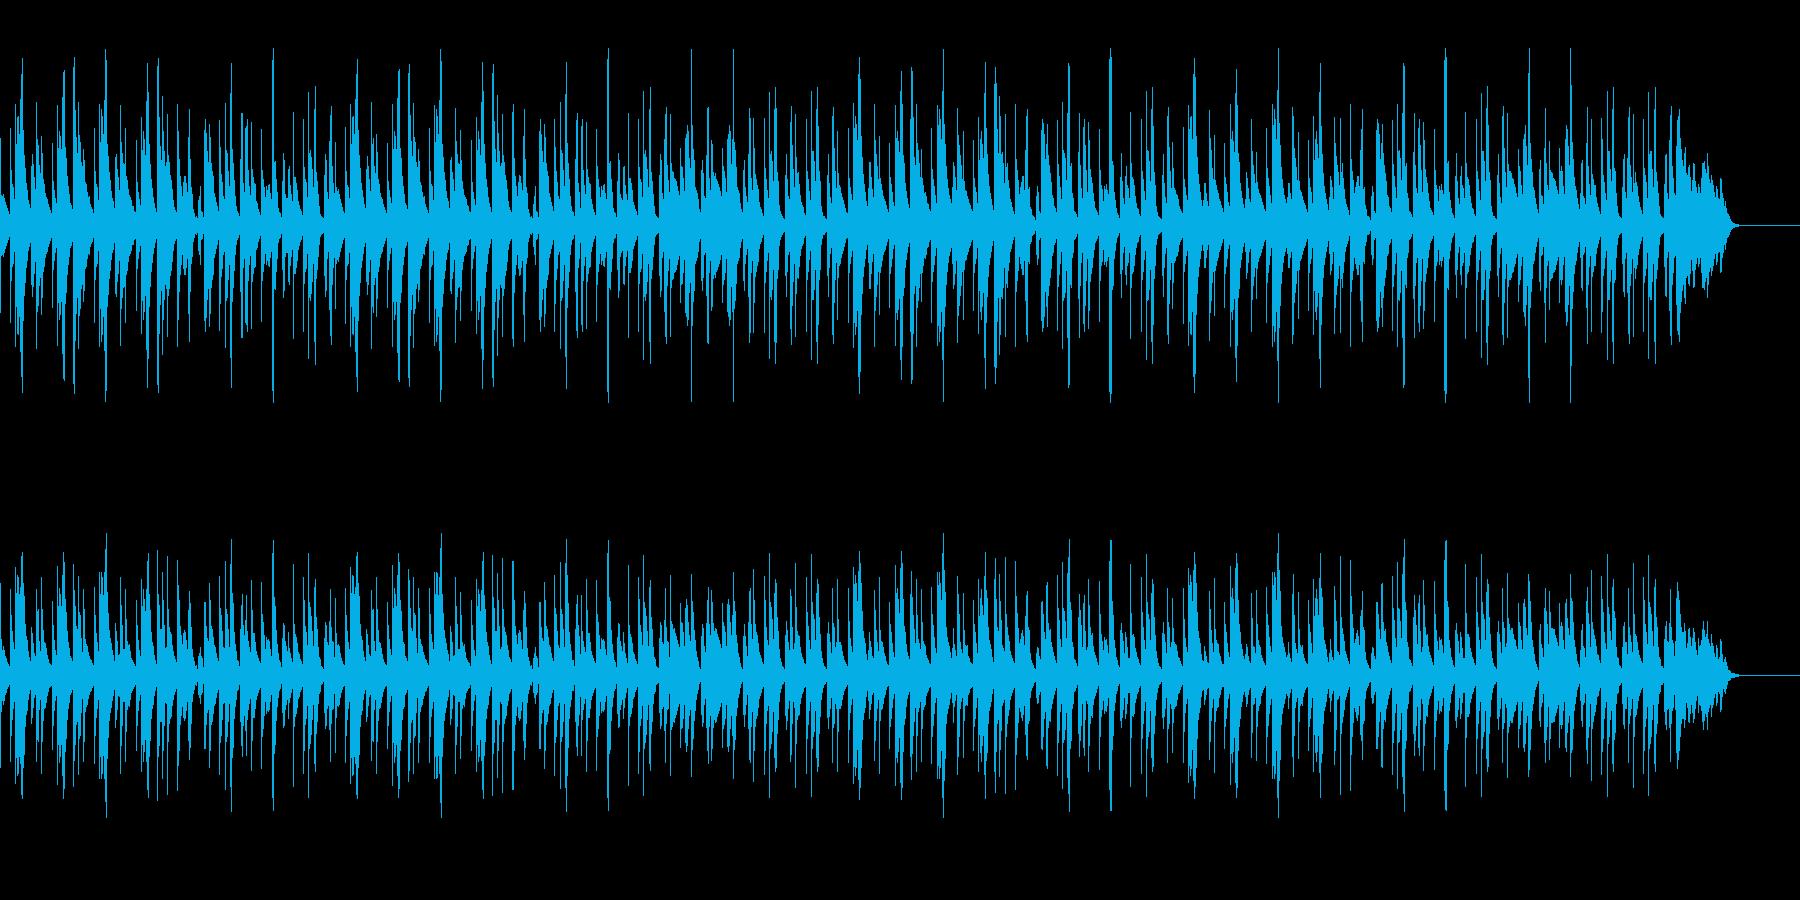 【youtube】ほのぼの系マリンバソロの再生済みの波形